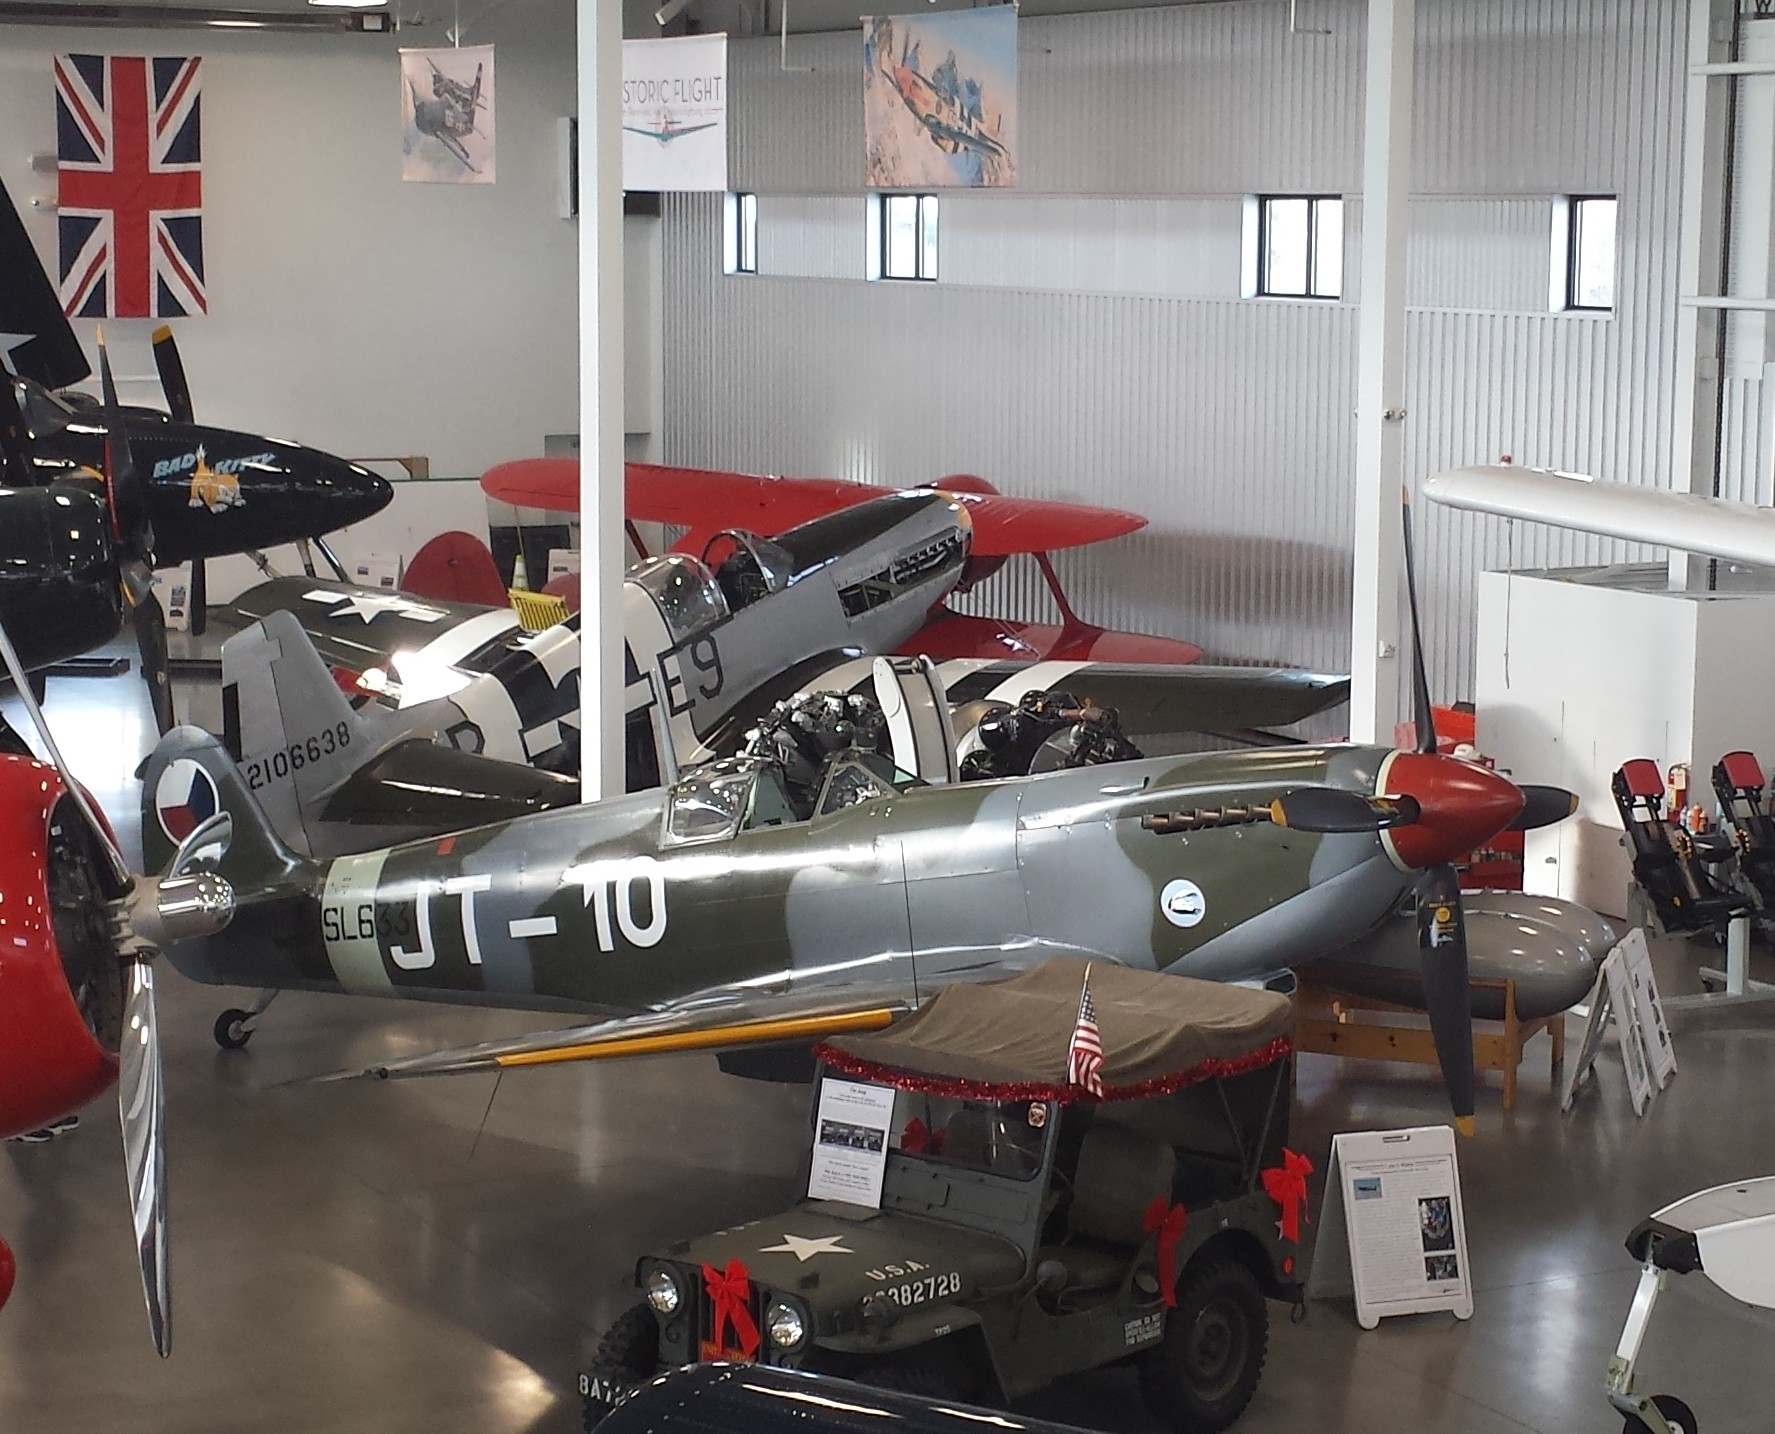 Spitfire at Historic Flight Foundation, Mukilteo, WA, December 2014.